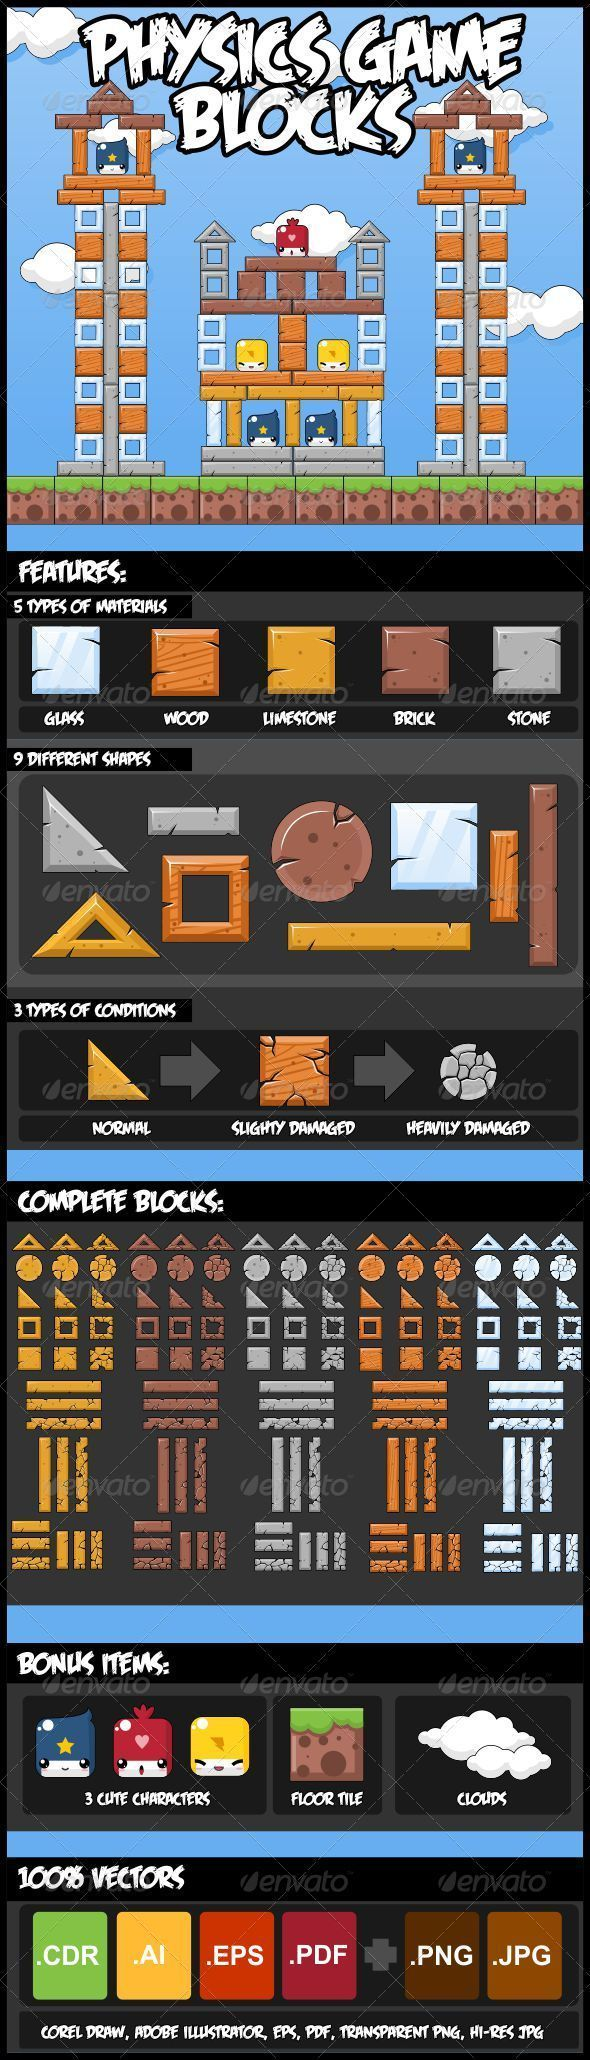 Physics Game Block Set Download here: https://graphicriver.net/item/physics-game-block-set/2982272?ref=KlitVogli